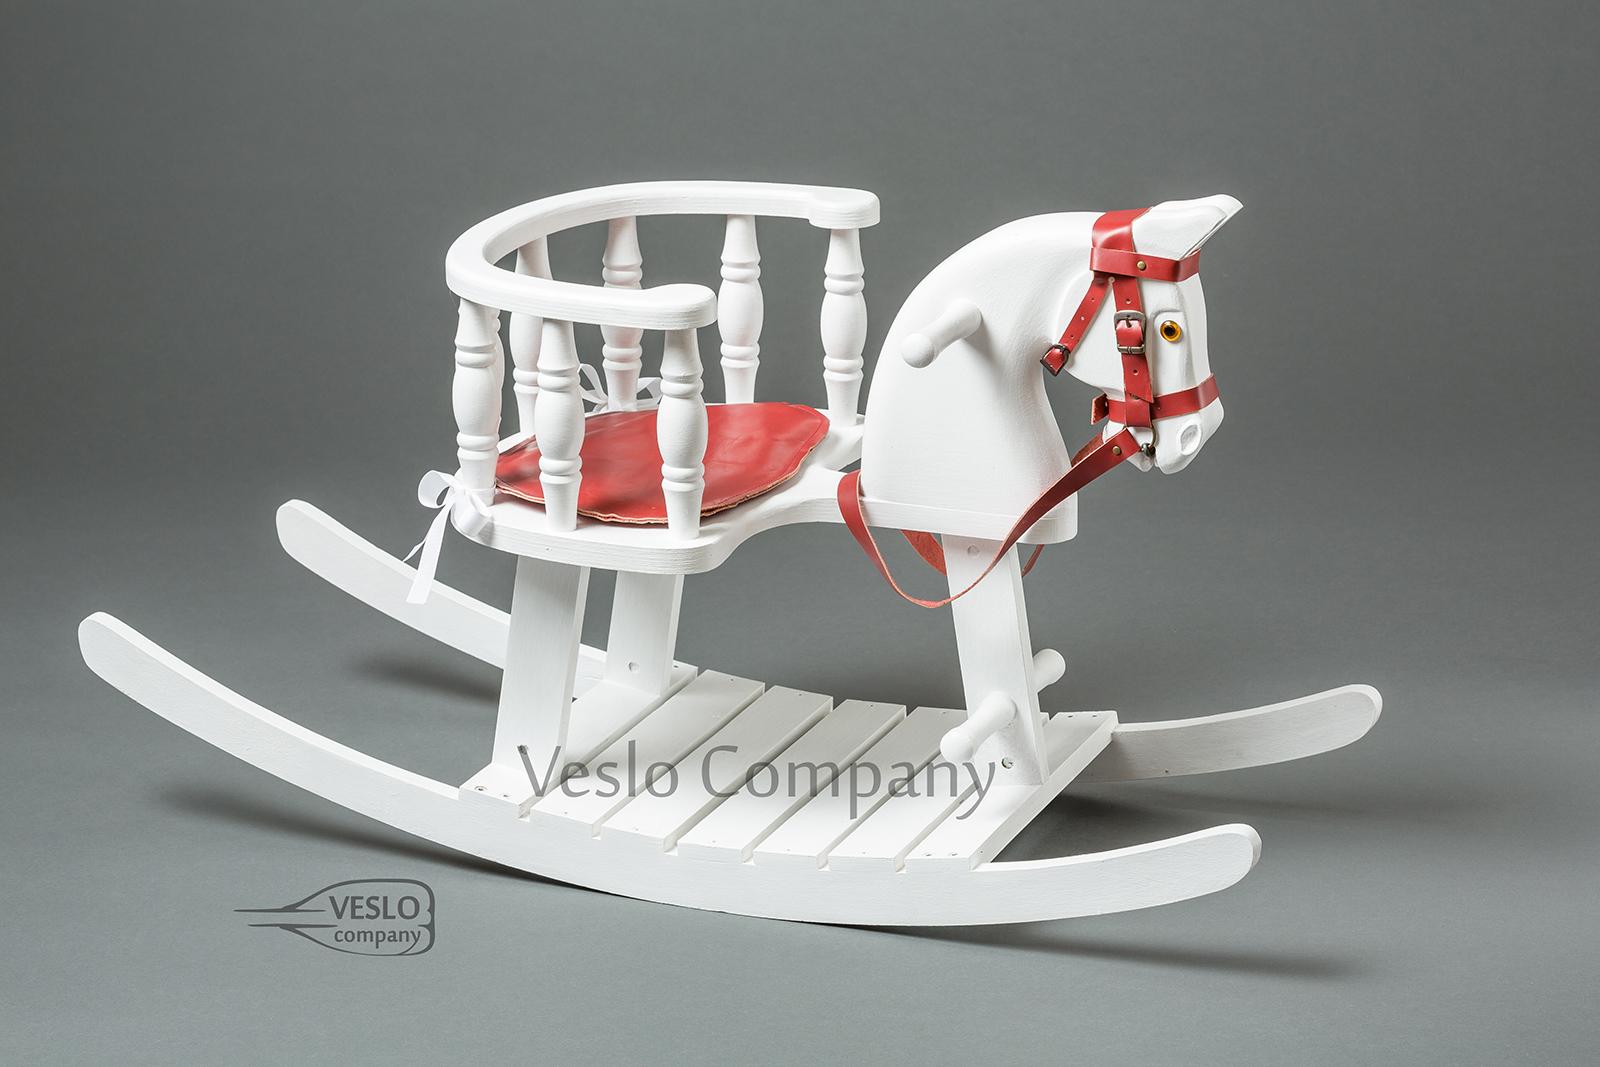 Pure Diamond - Veslo Company